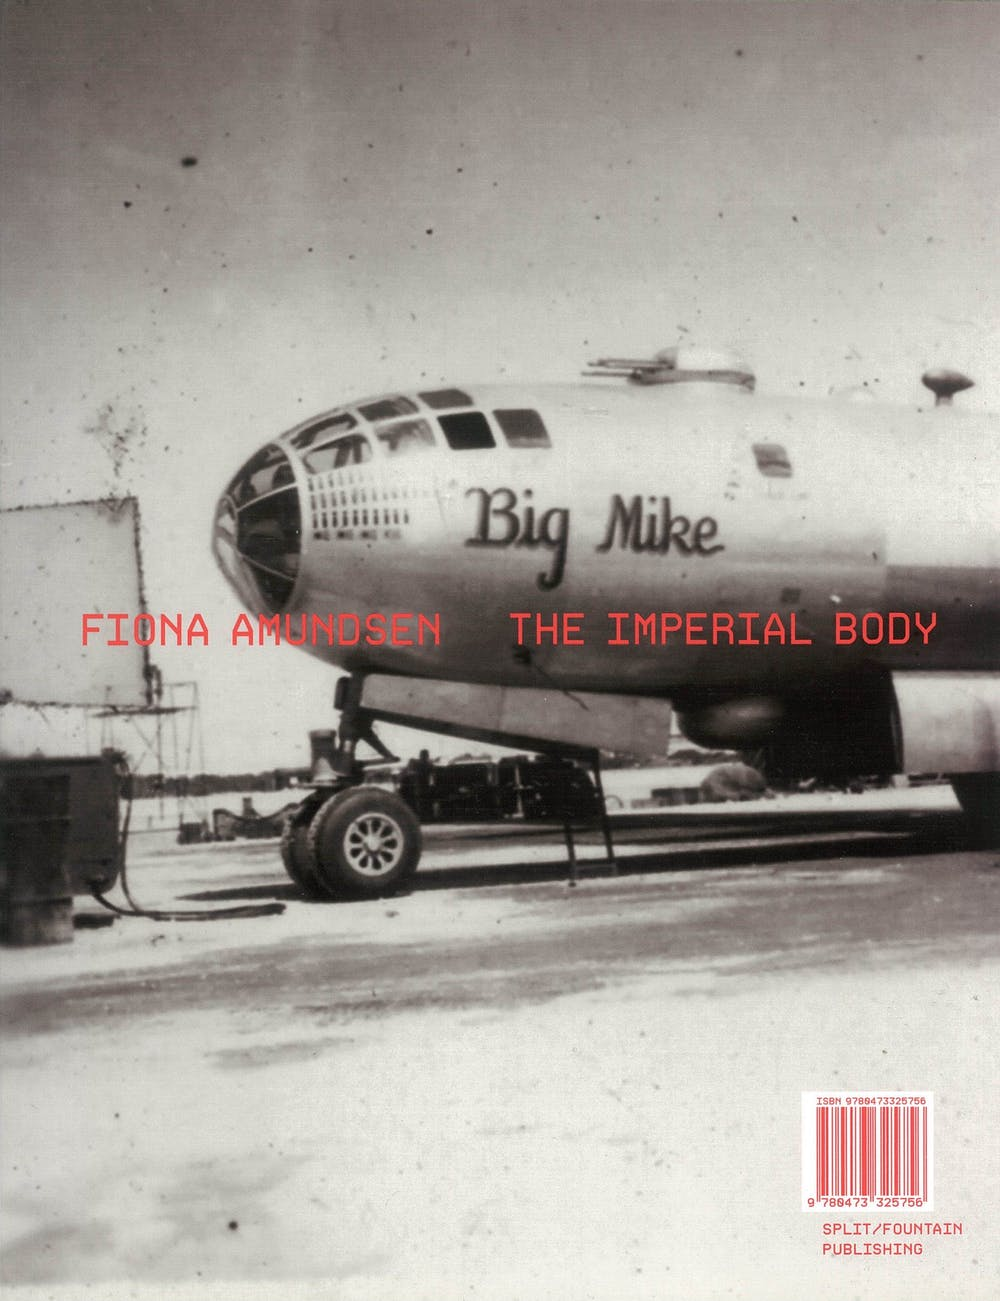 Fiona Amundsen The Imperial Body